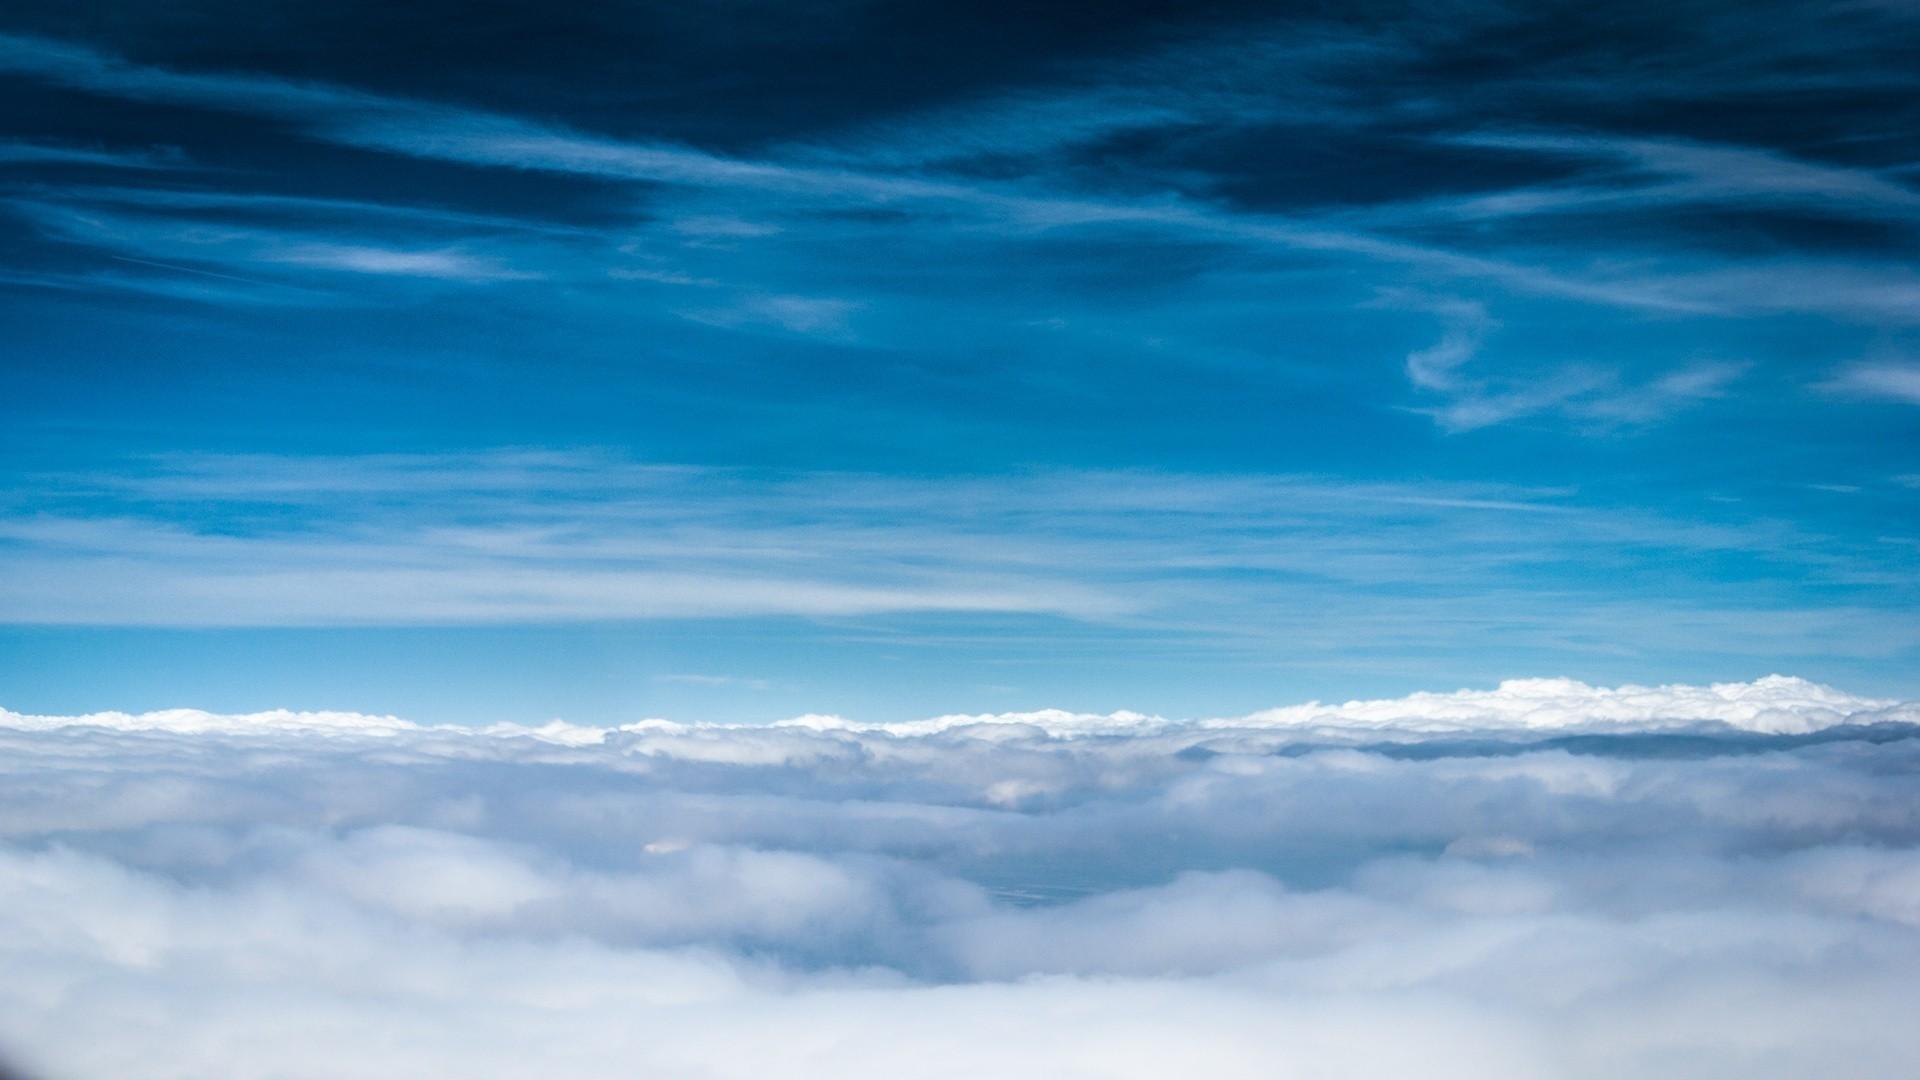 Blue Cloud Wallpaper image hd